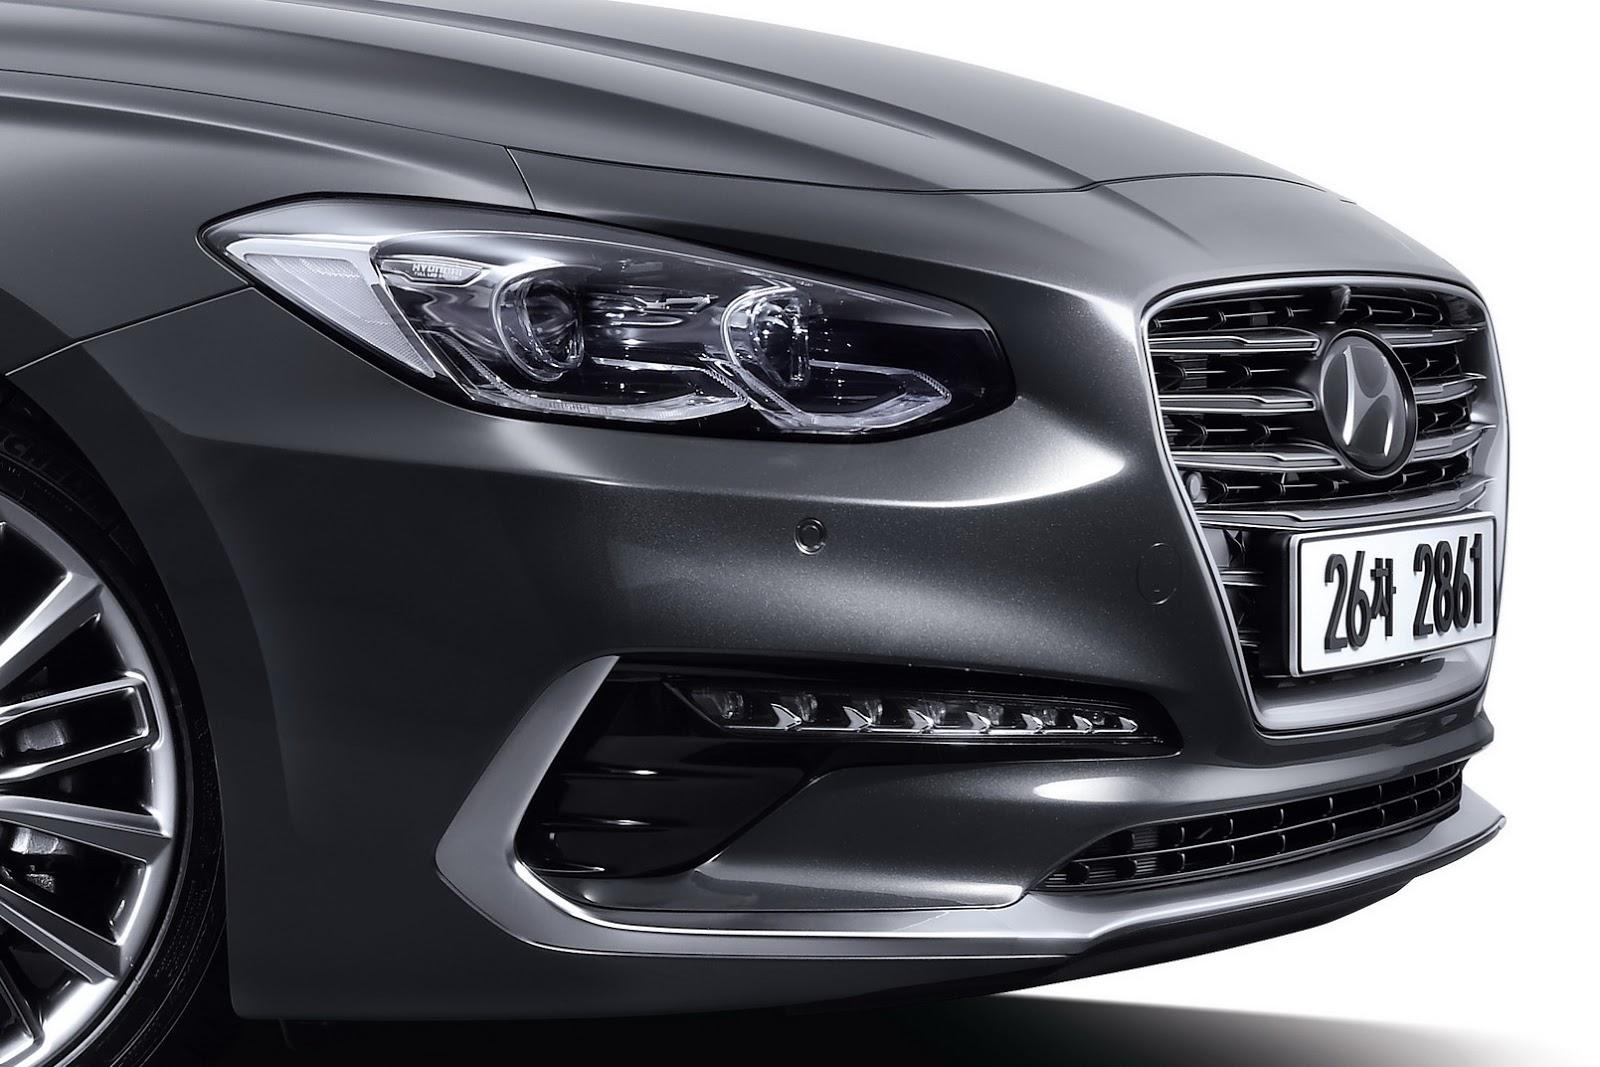 2017 Hyundai Azera Grandeur Revealed In The Flesh What